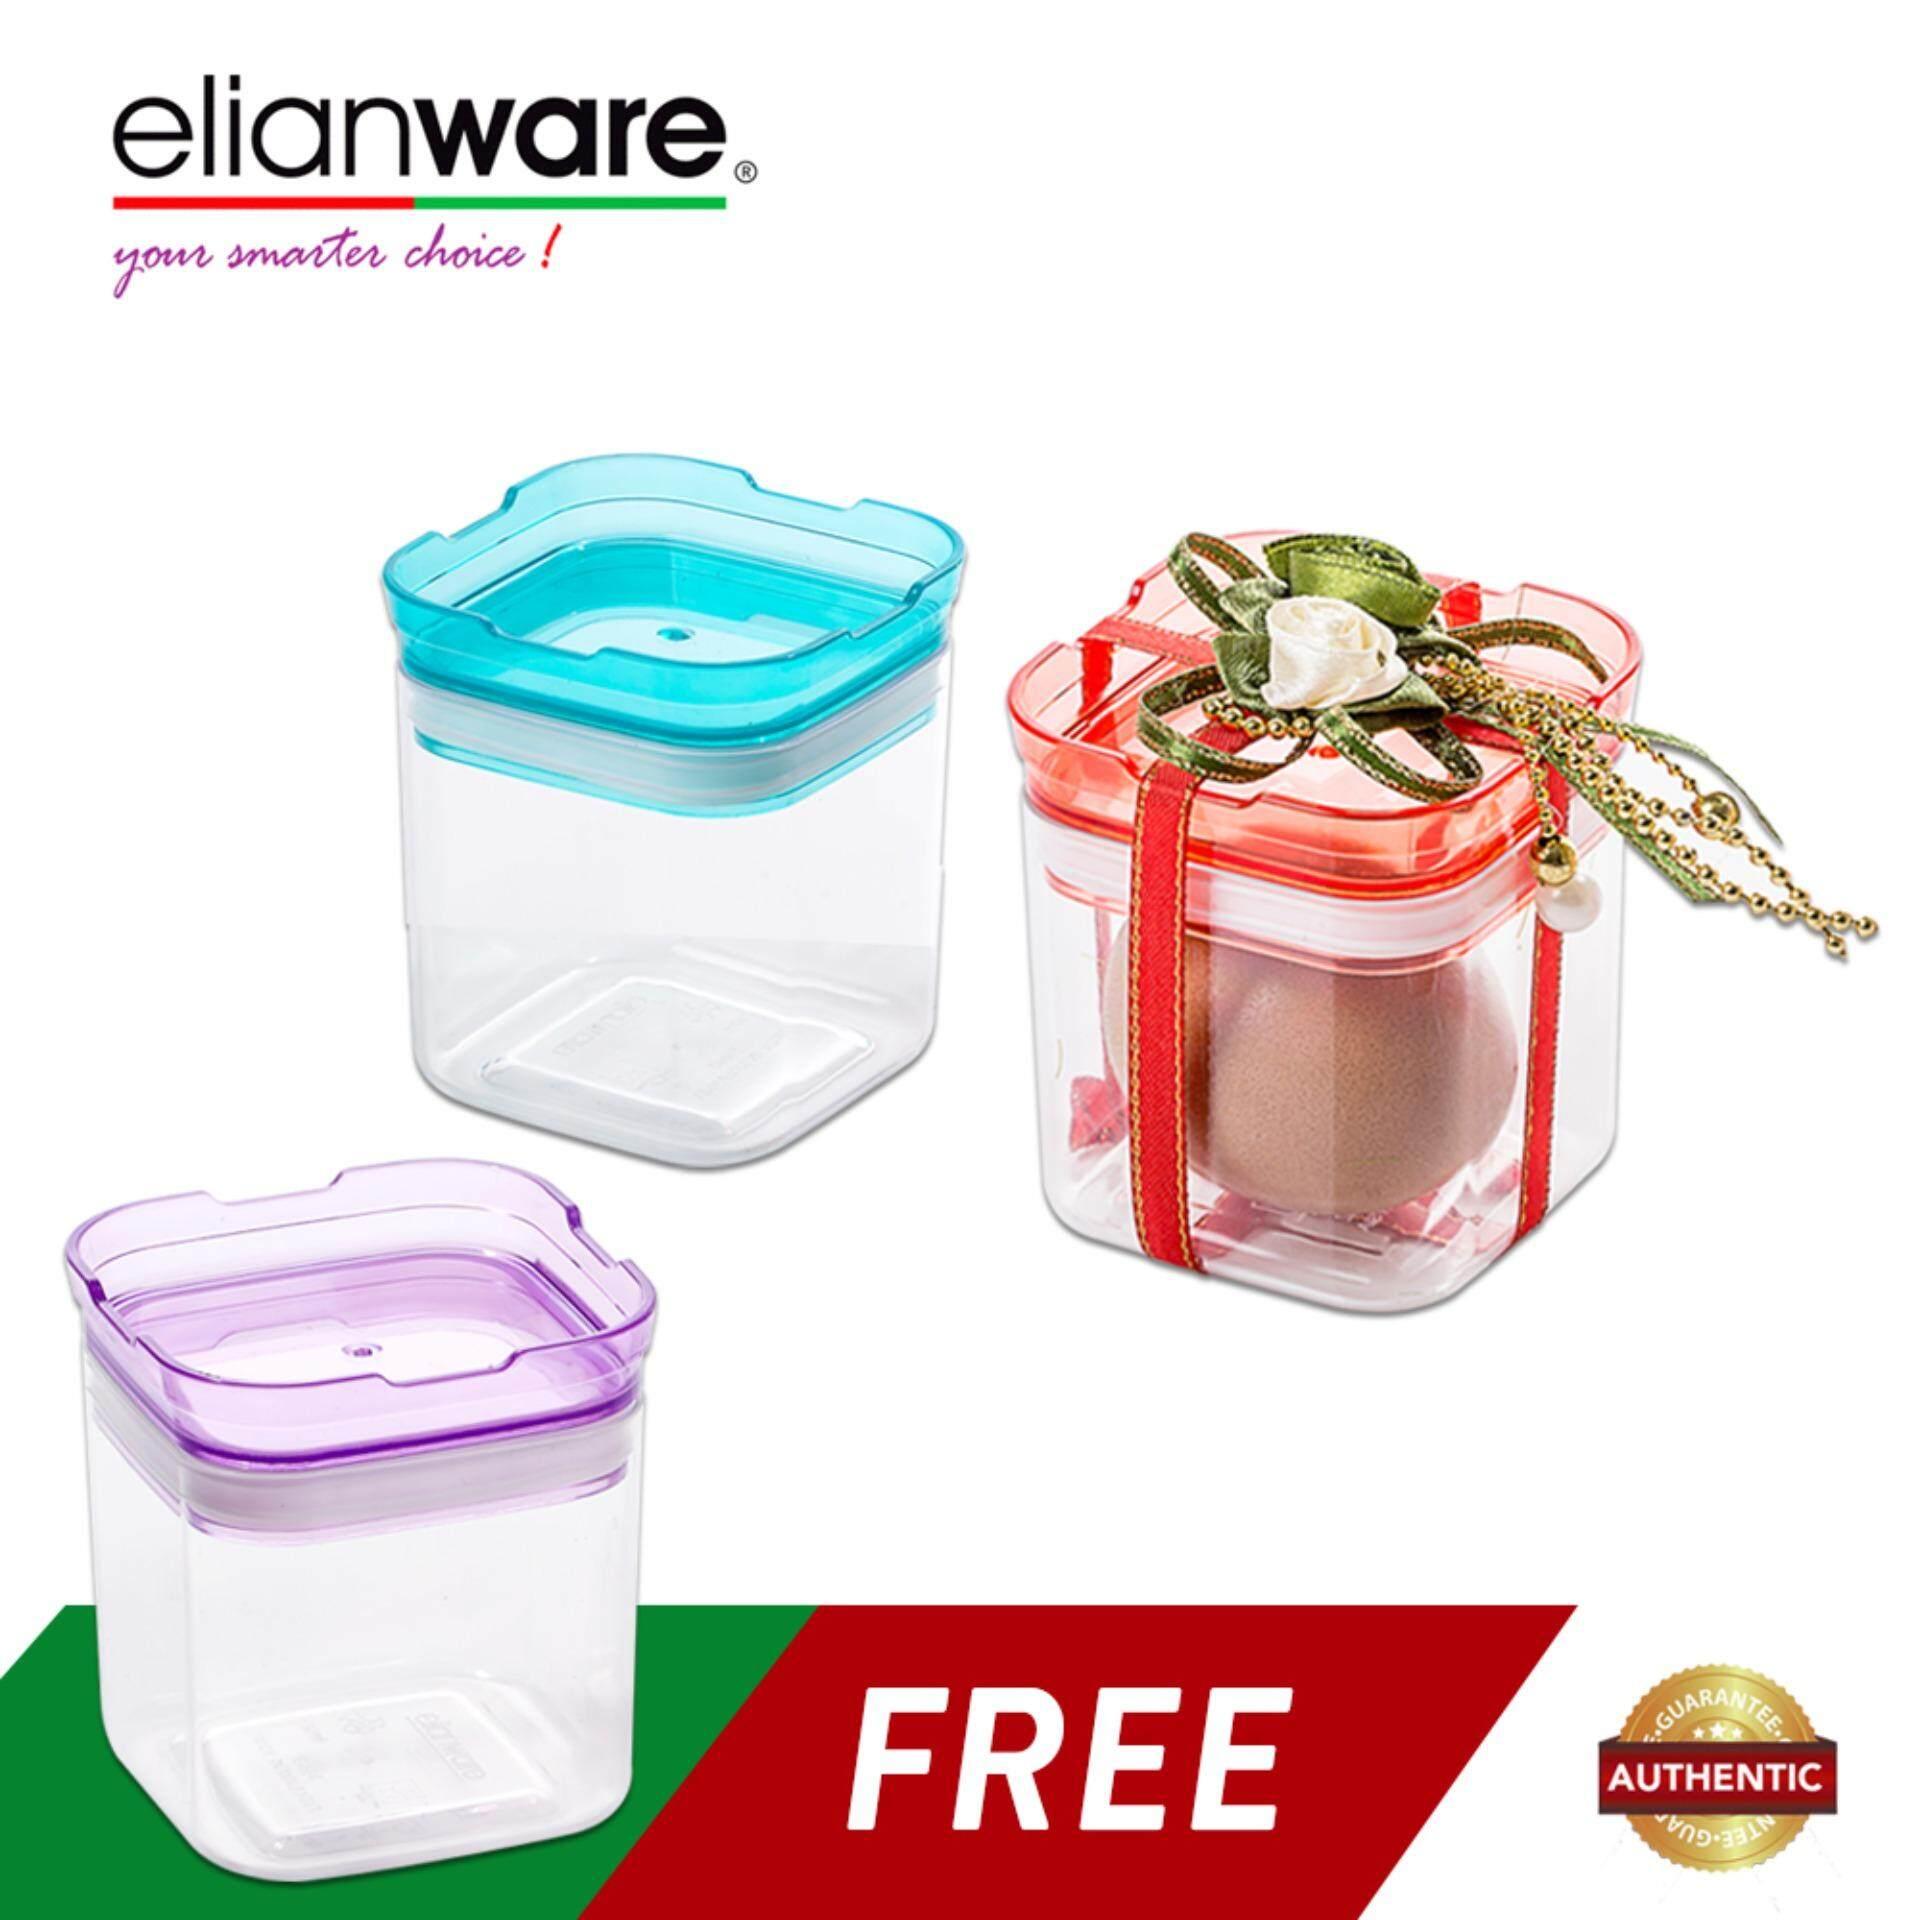 Elianware 150ml Wedding/Birthday Gifts Multipurpose Airtight Mini Container